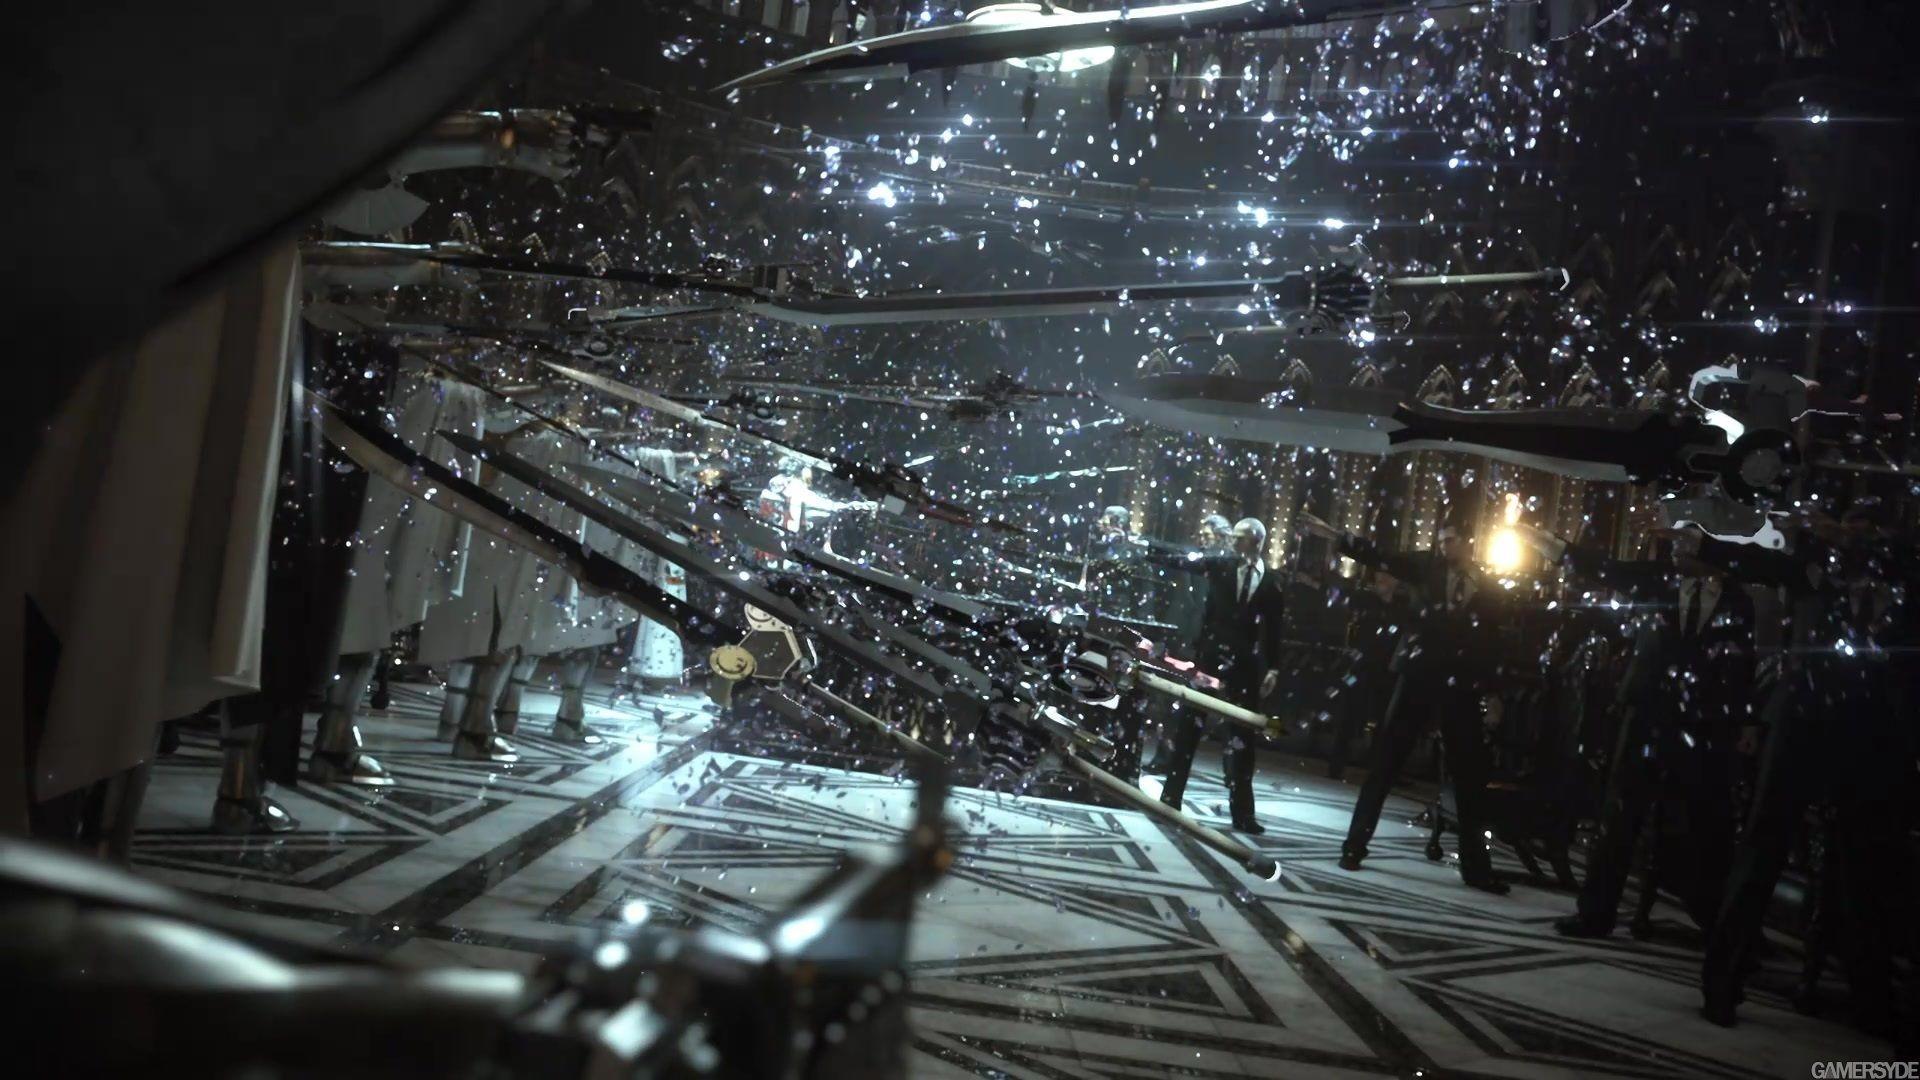 Final Fantasy 15 Noctis Wallpapers For Iphone Sdeerwallpaper